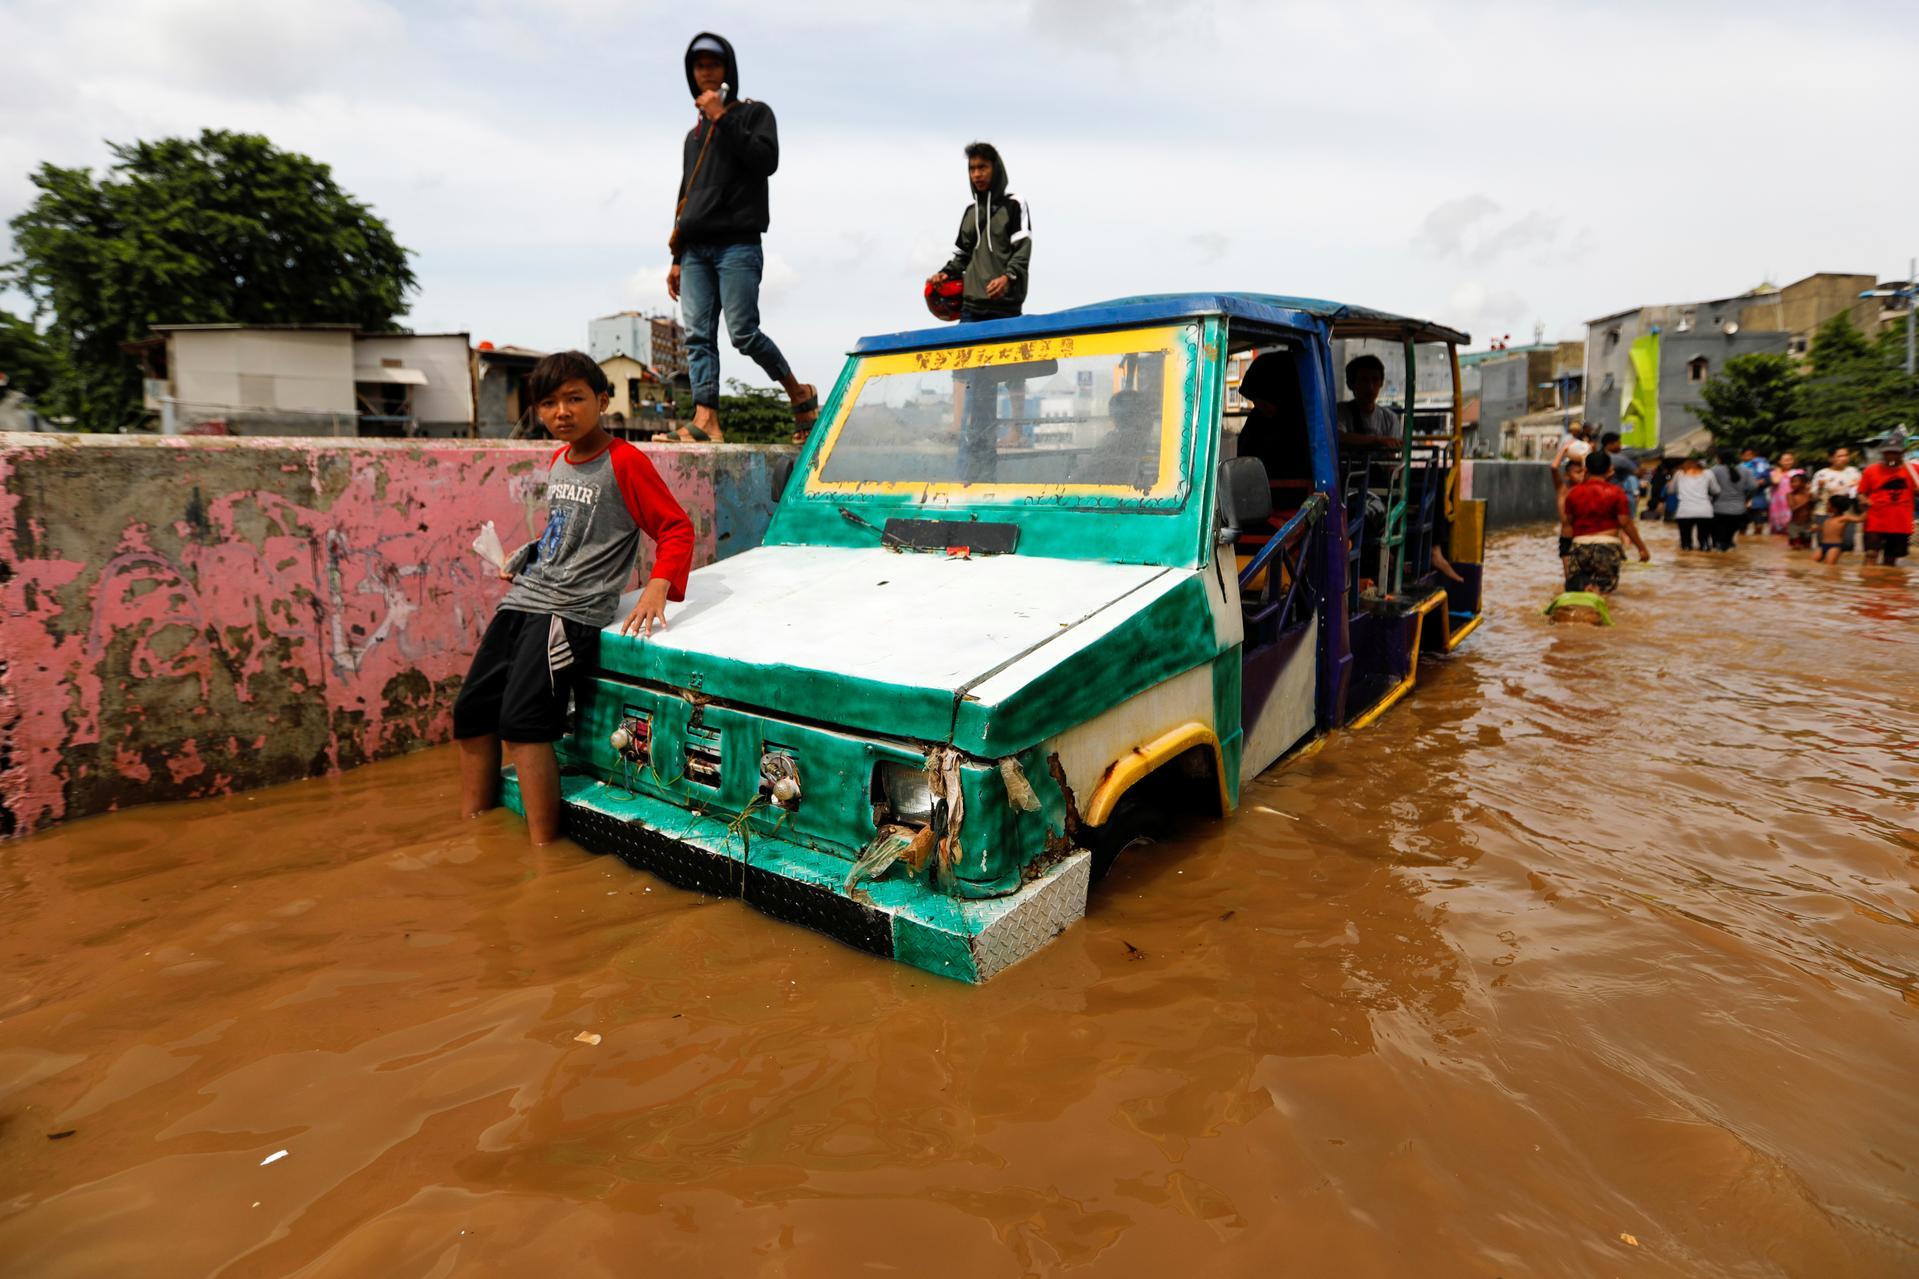 Indonesia plans cloud seeding to halt rain as floods death toll hits 30